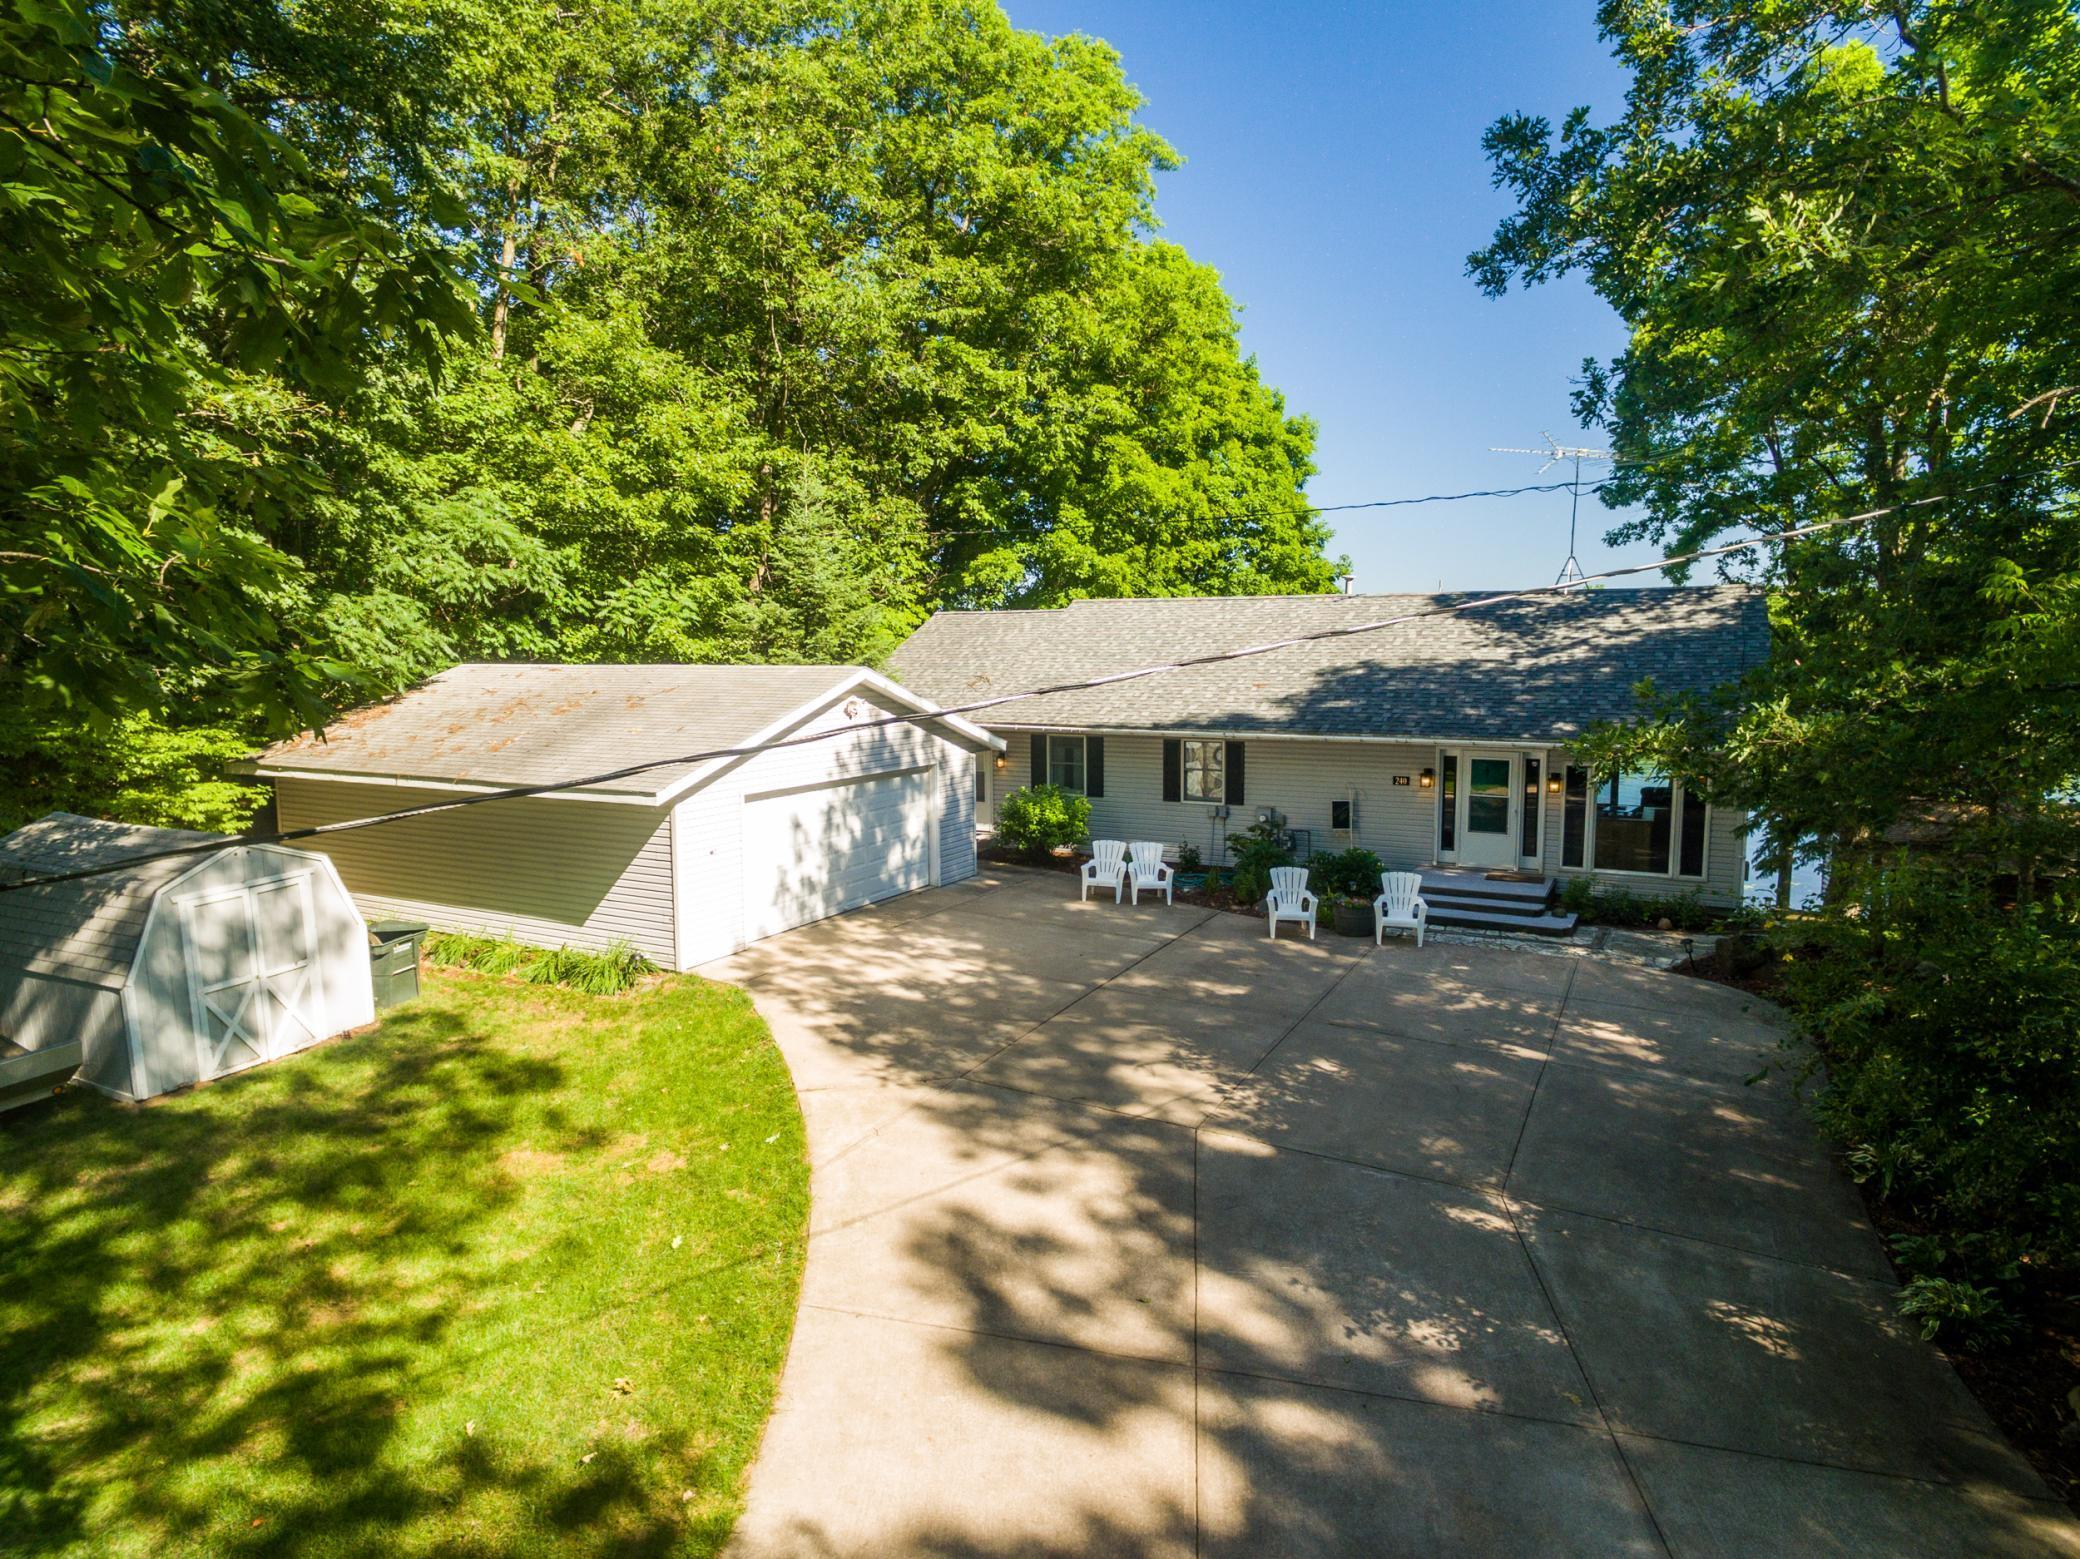 240 County Road I Property Photo - Balsam Lake, WI real estate listing